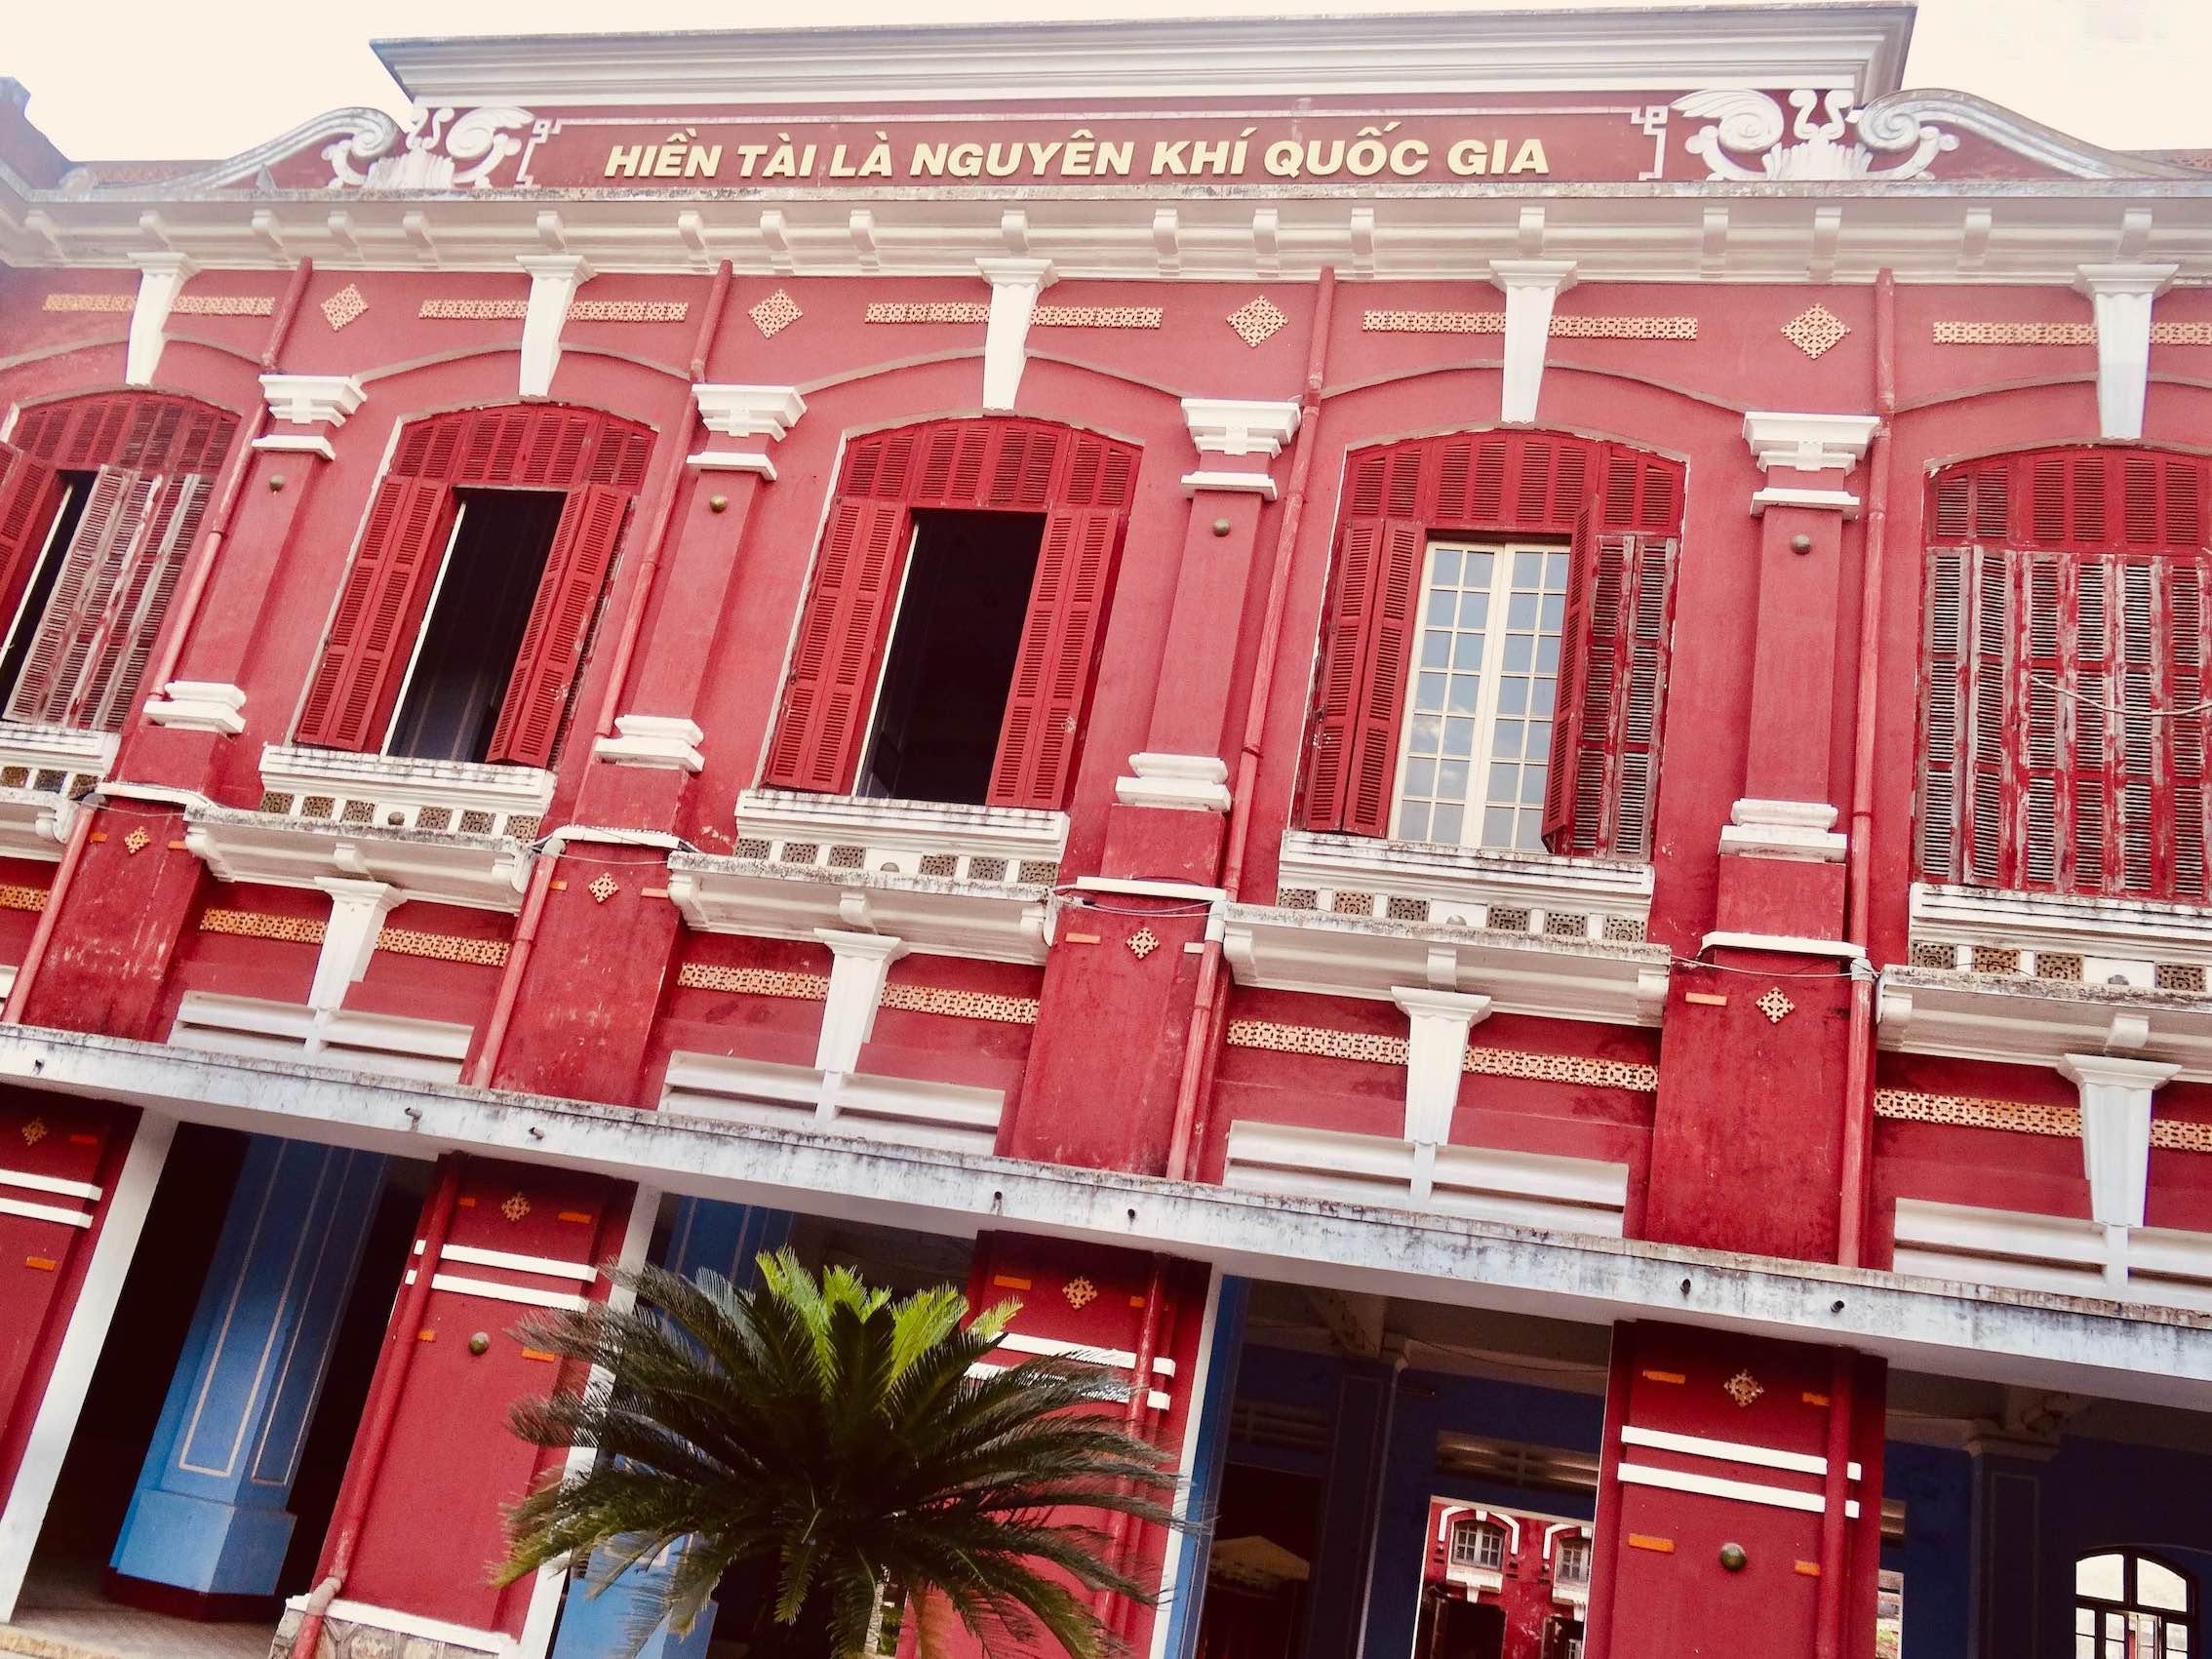 The National School Hue Vietnam.